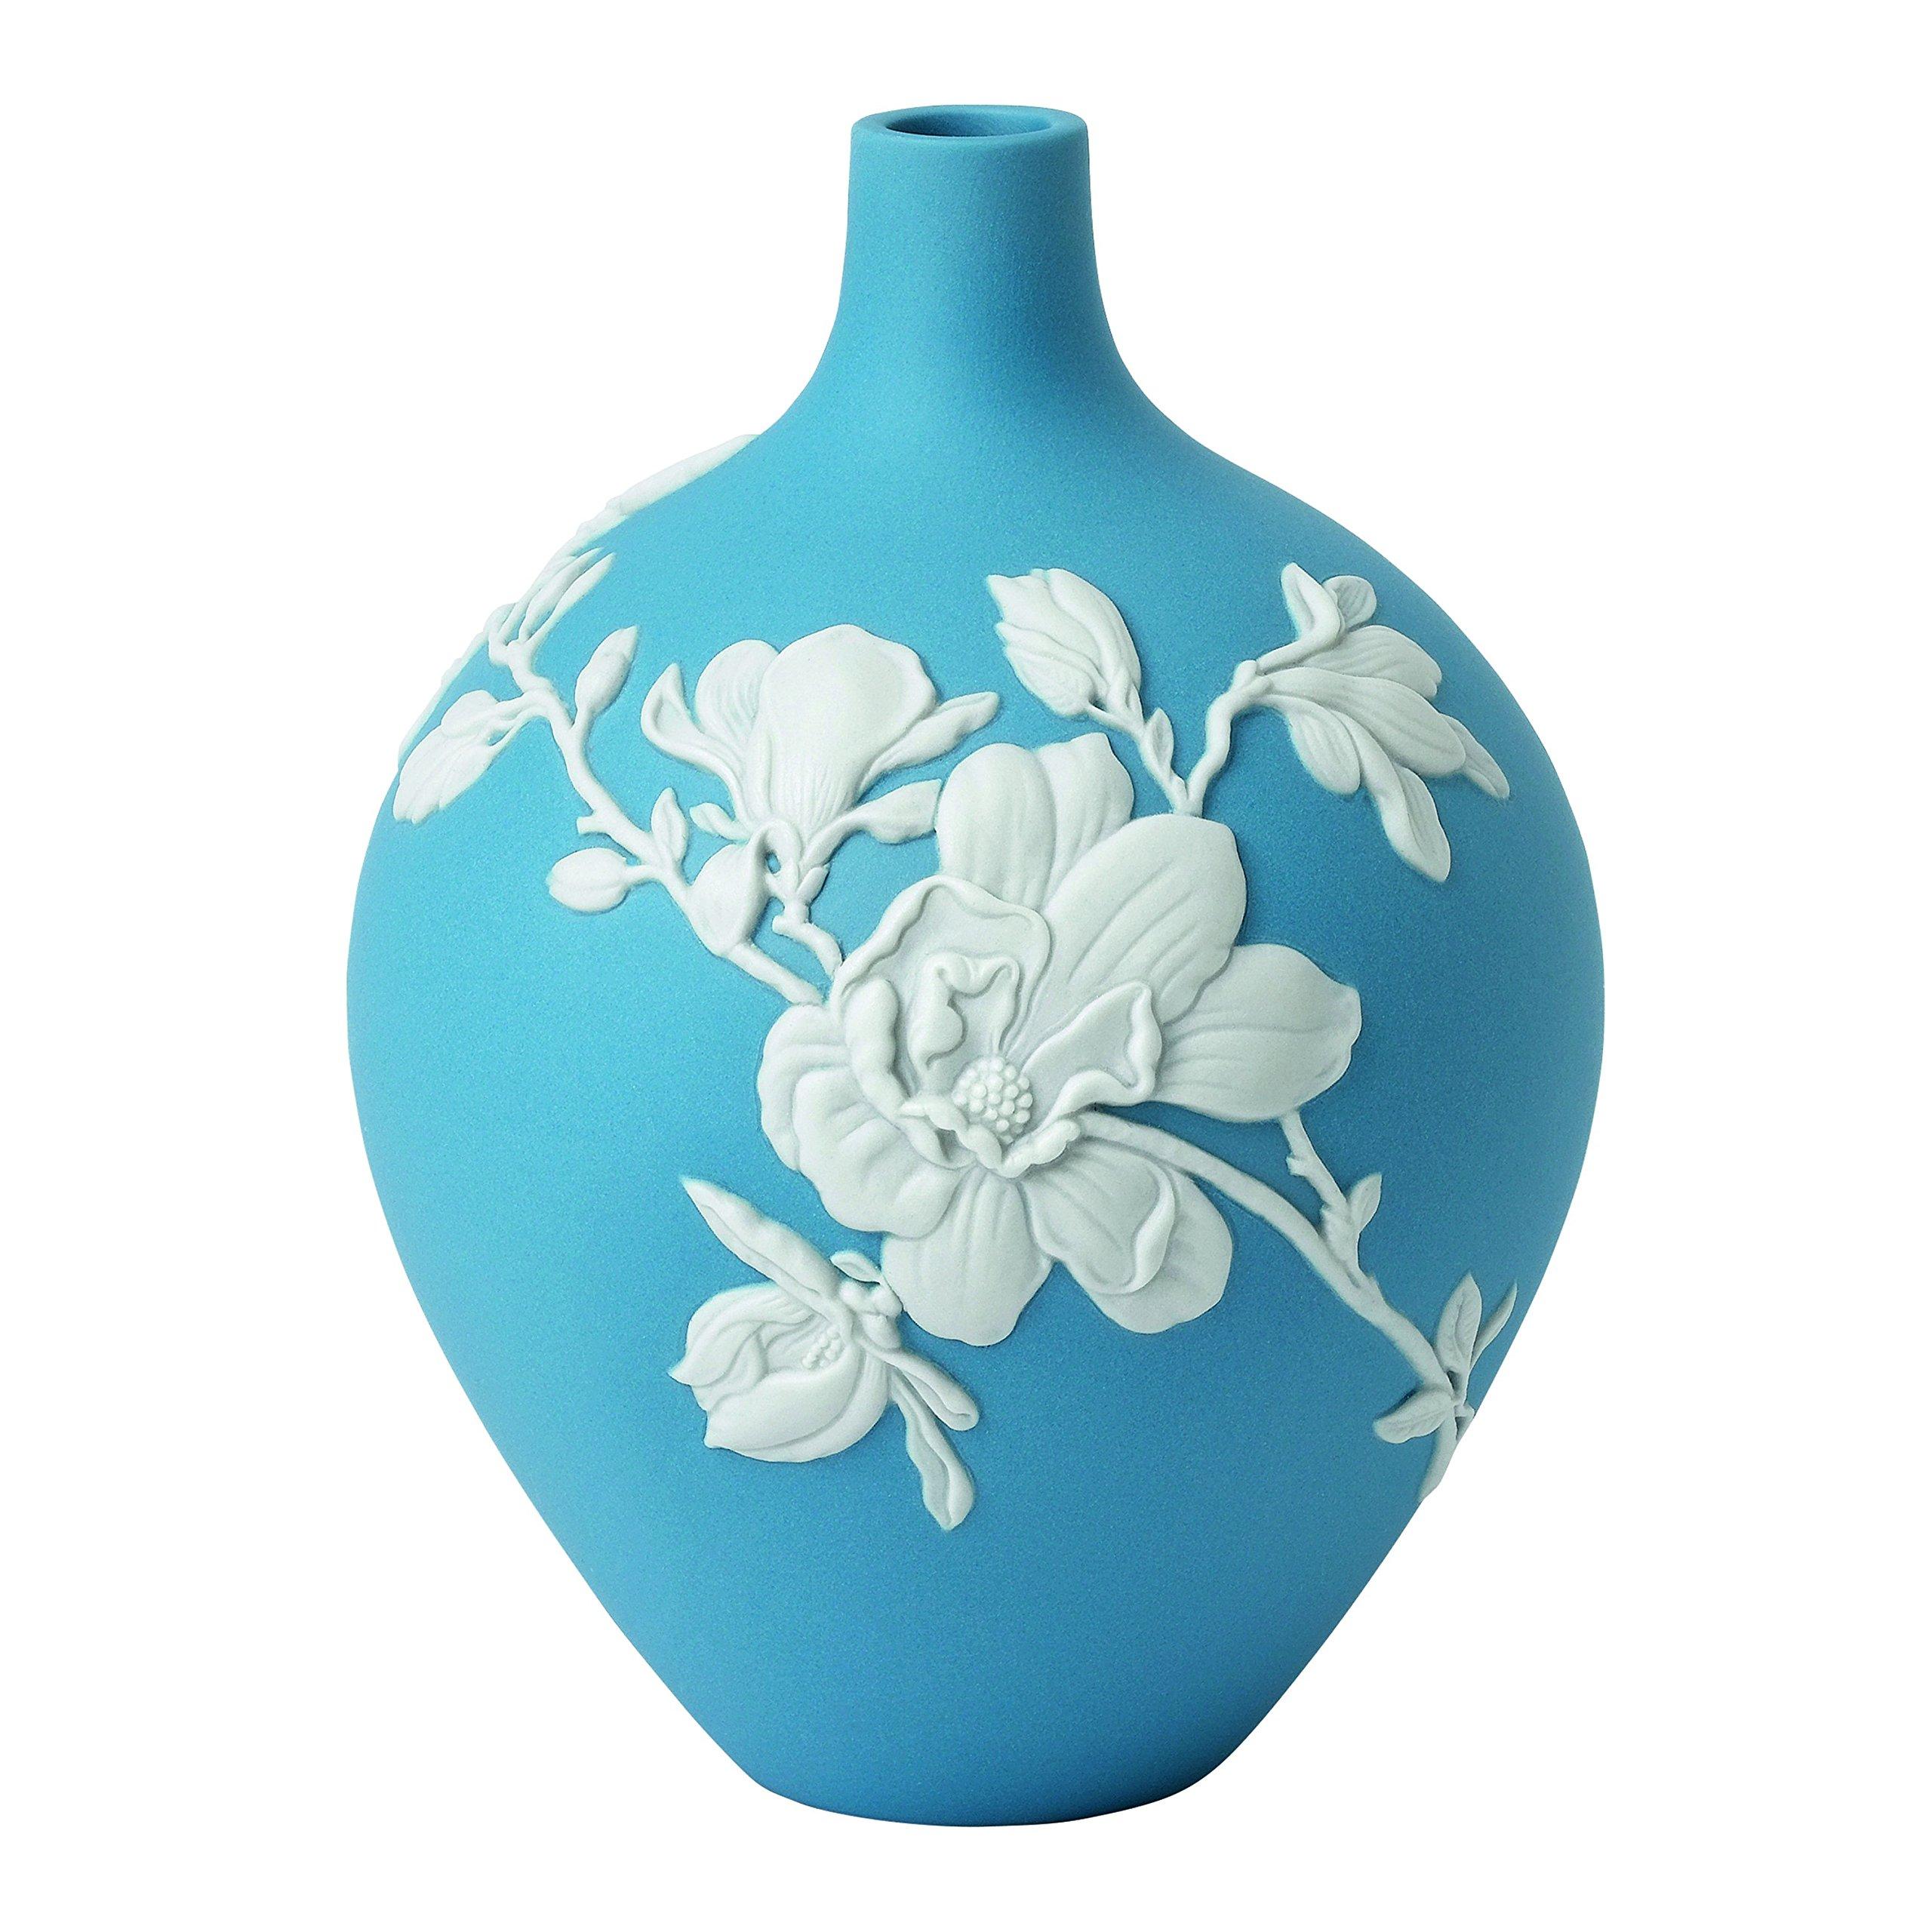 Wedgwood Magnolia Blossom Vase 5'', Bud